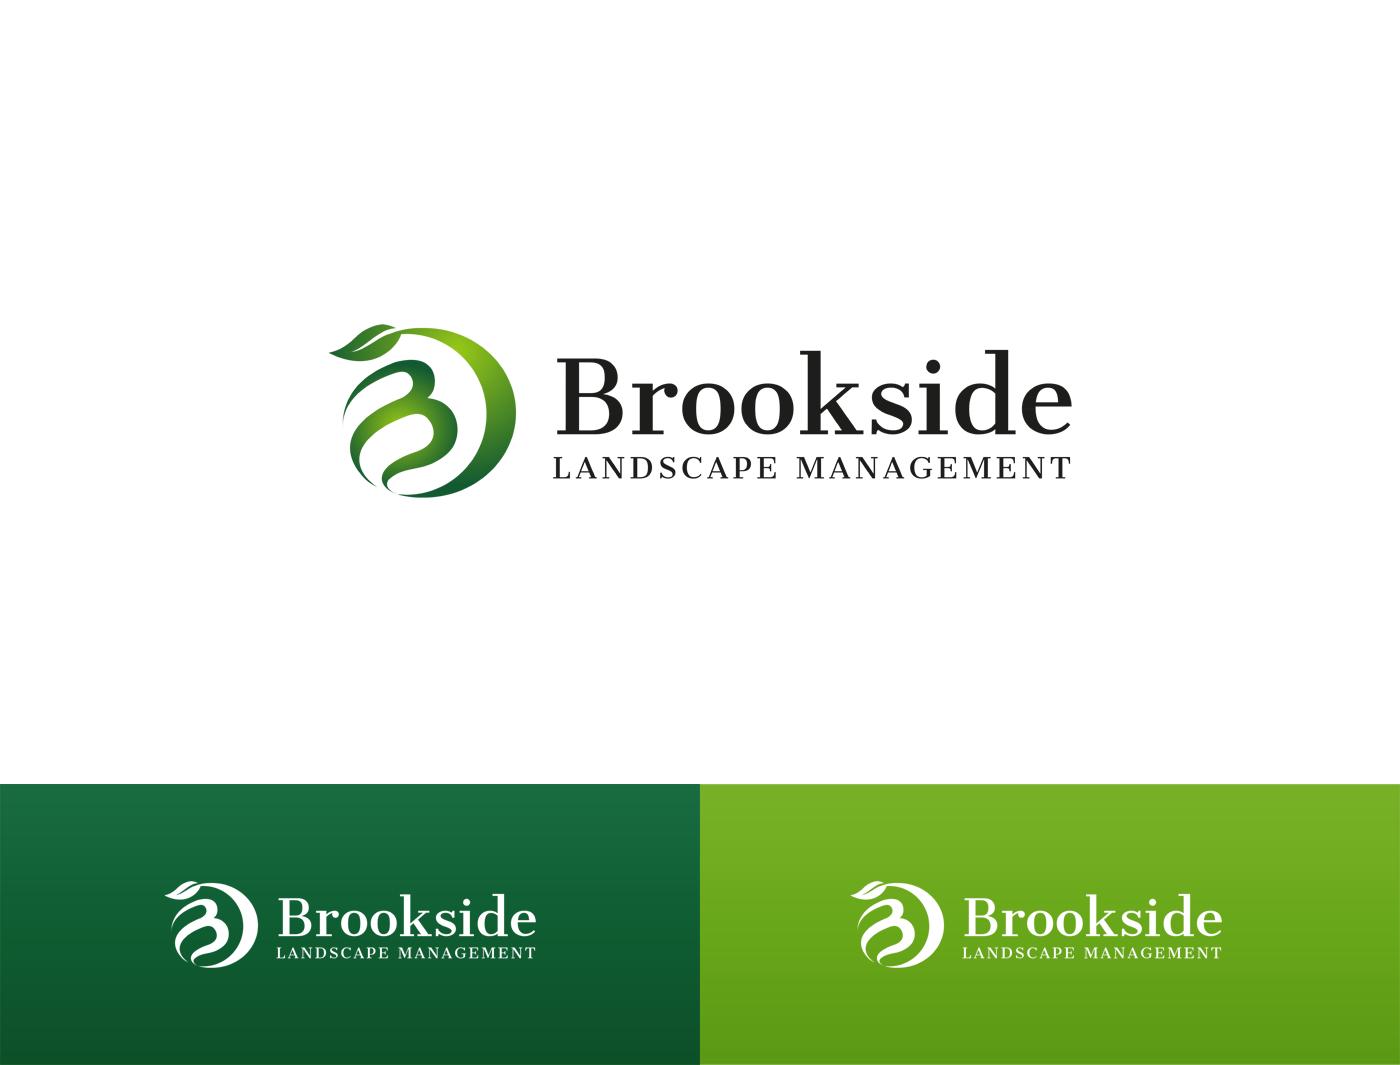 Logo Design by Alexander Osokin - Entry No. 82 in the Logo Design Contest New Logo Design for Brookside Landscape Management.